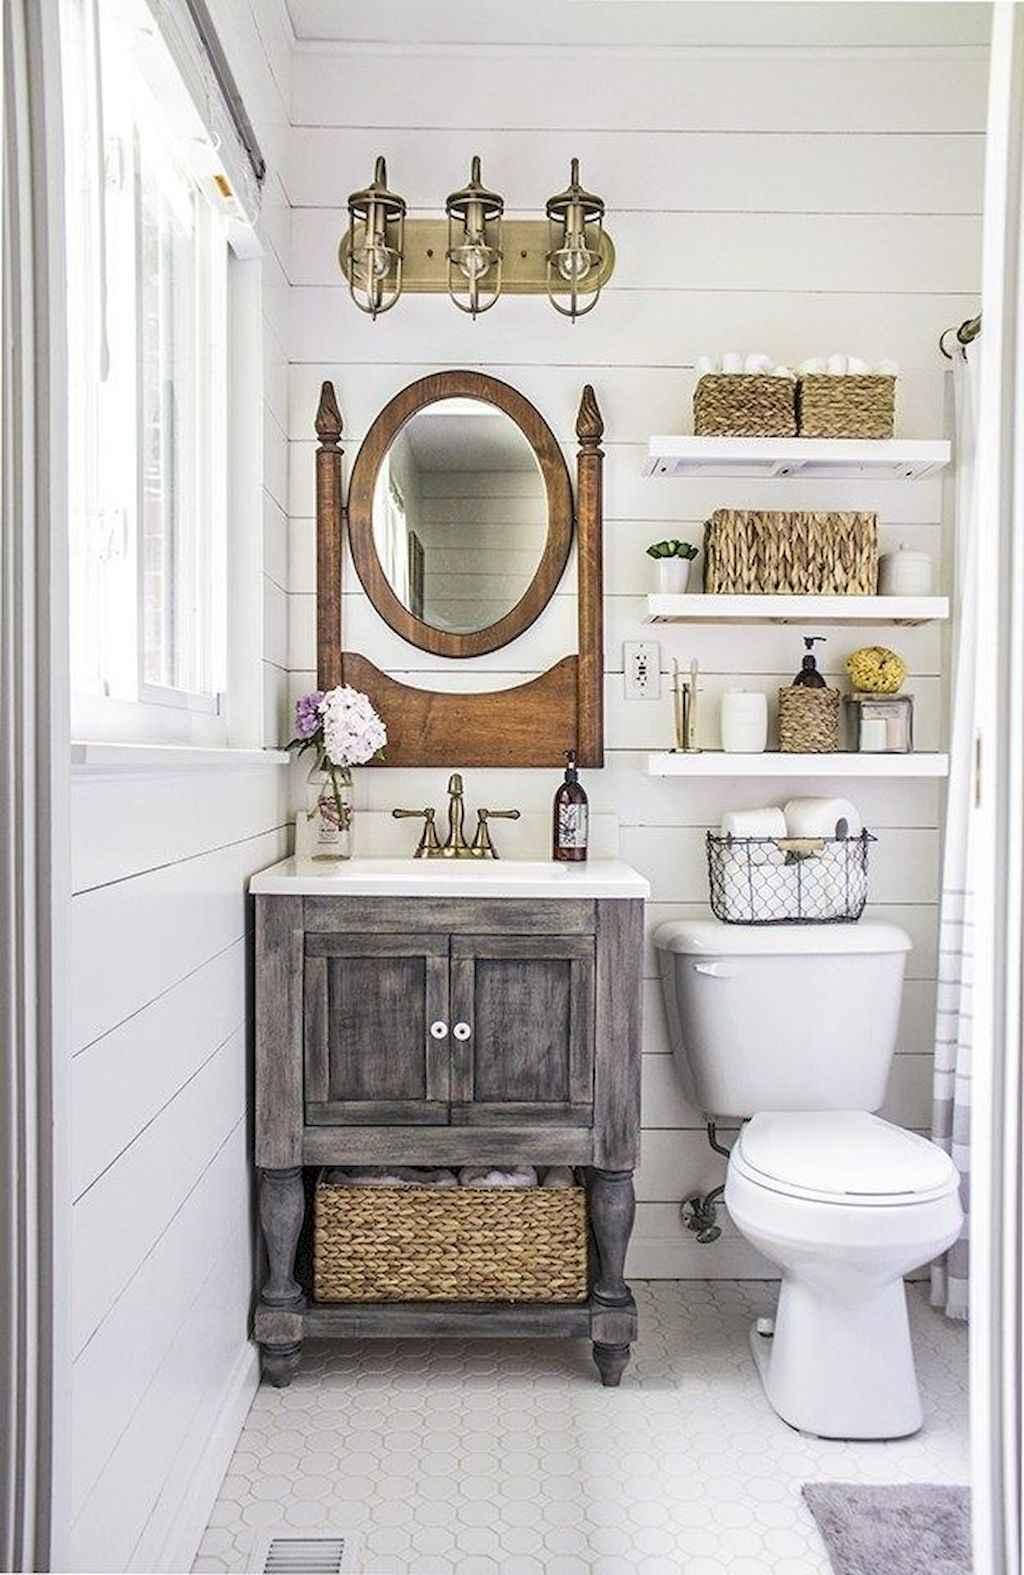 125 awesome farmhouse bathroom vanity remodel ideas (73)